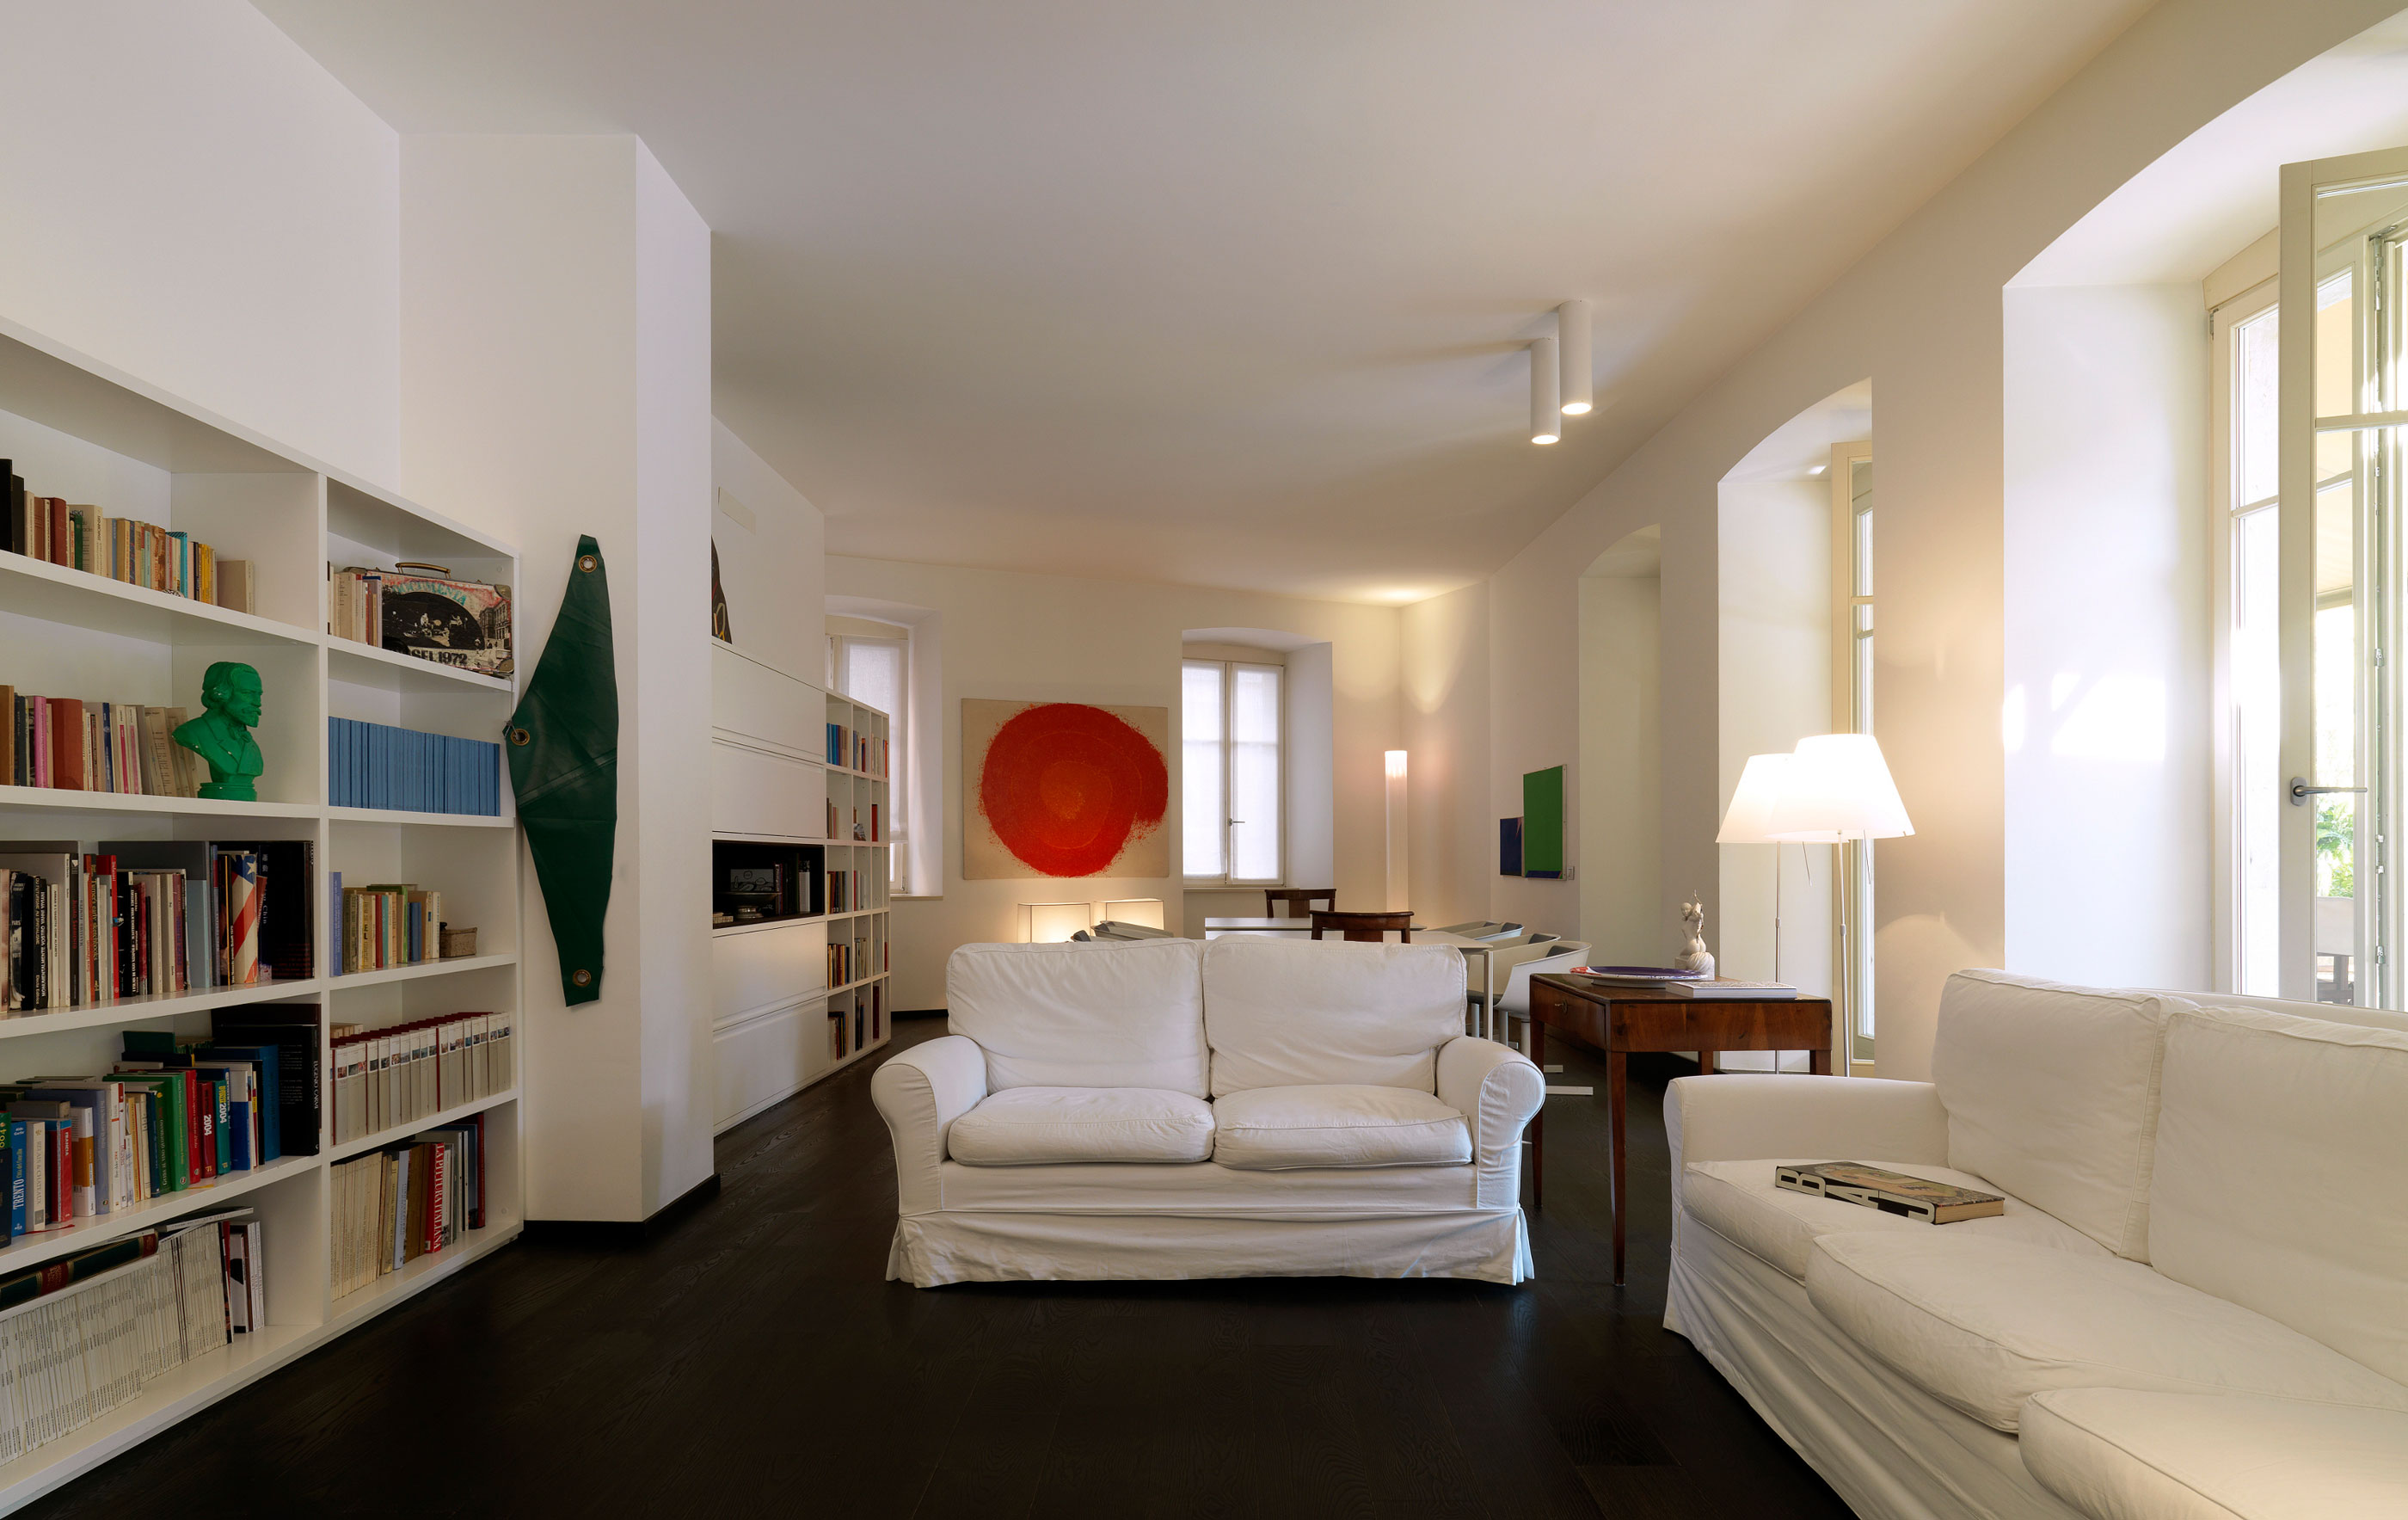 Trento apartment by baldessari e baldessari - Interior design trento ...